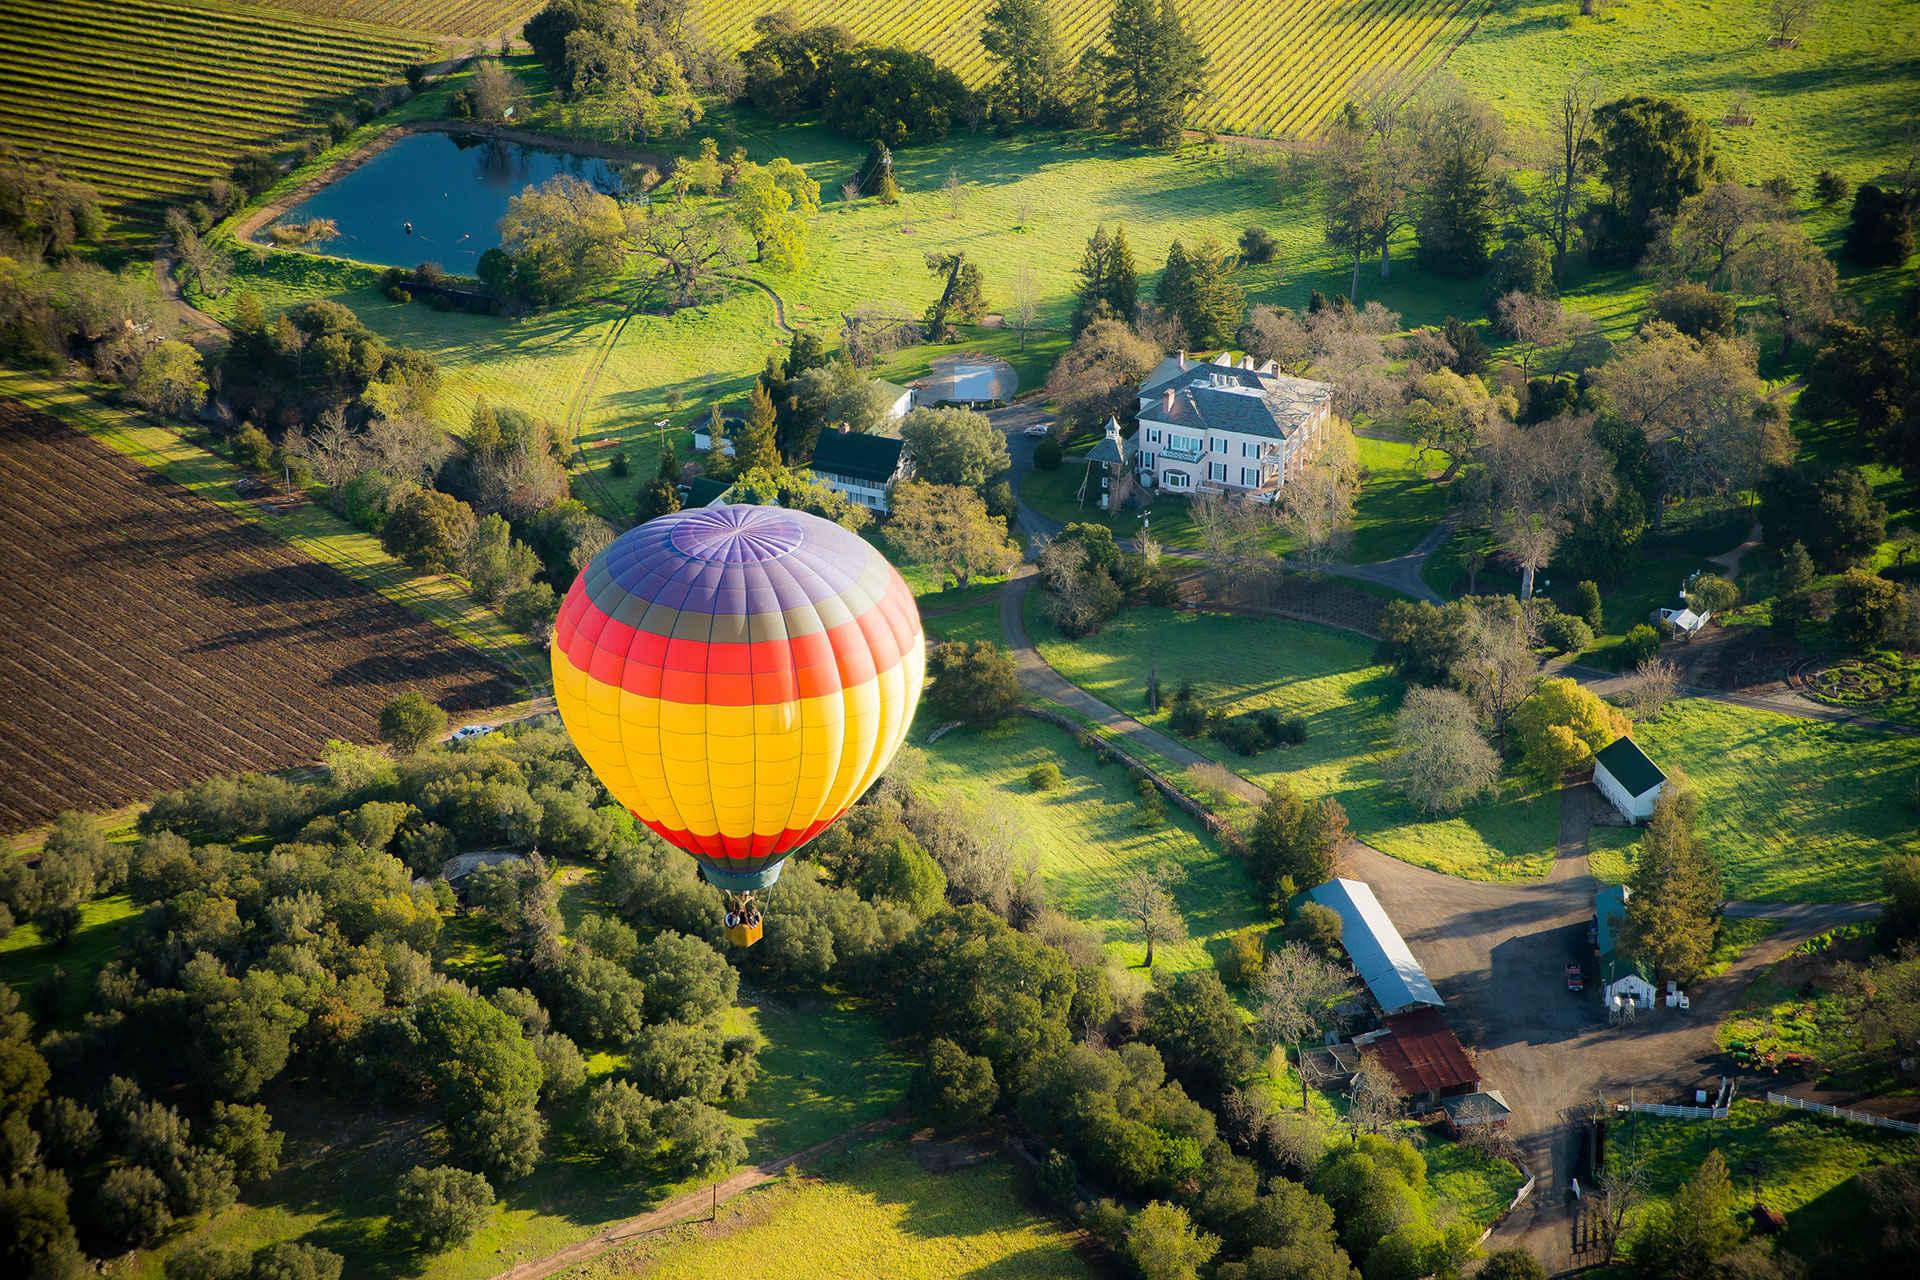 Hot Air Balloon Over Napa Valey, California